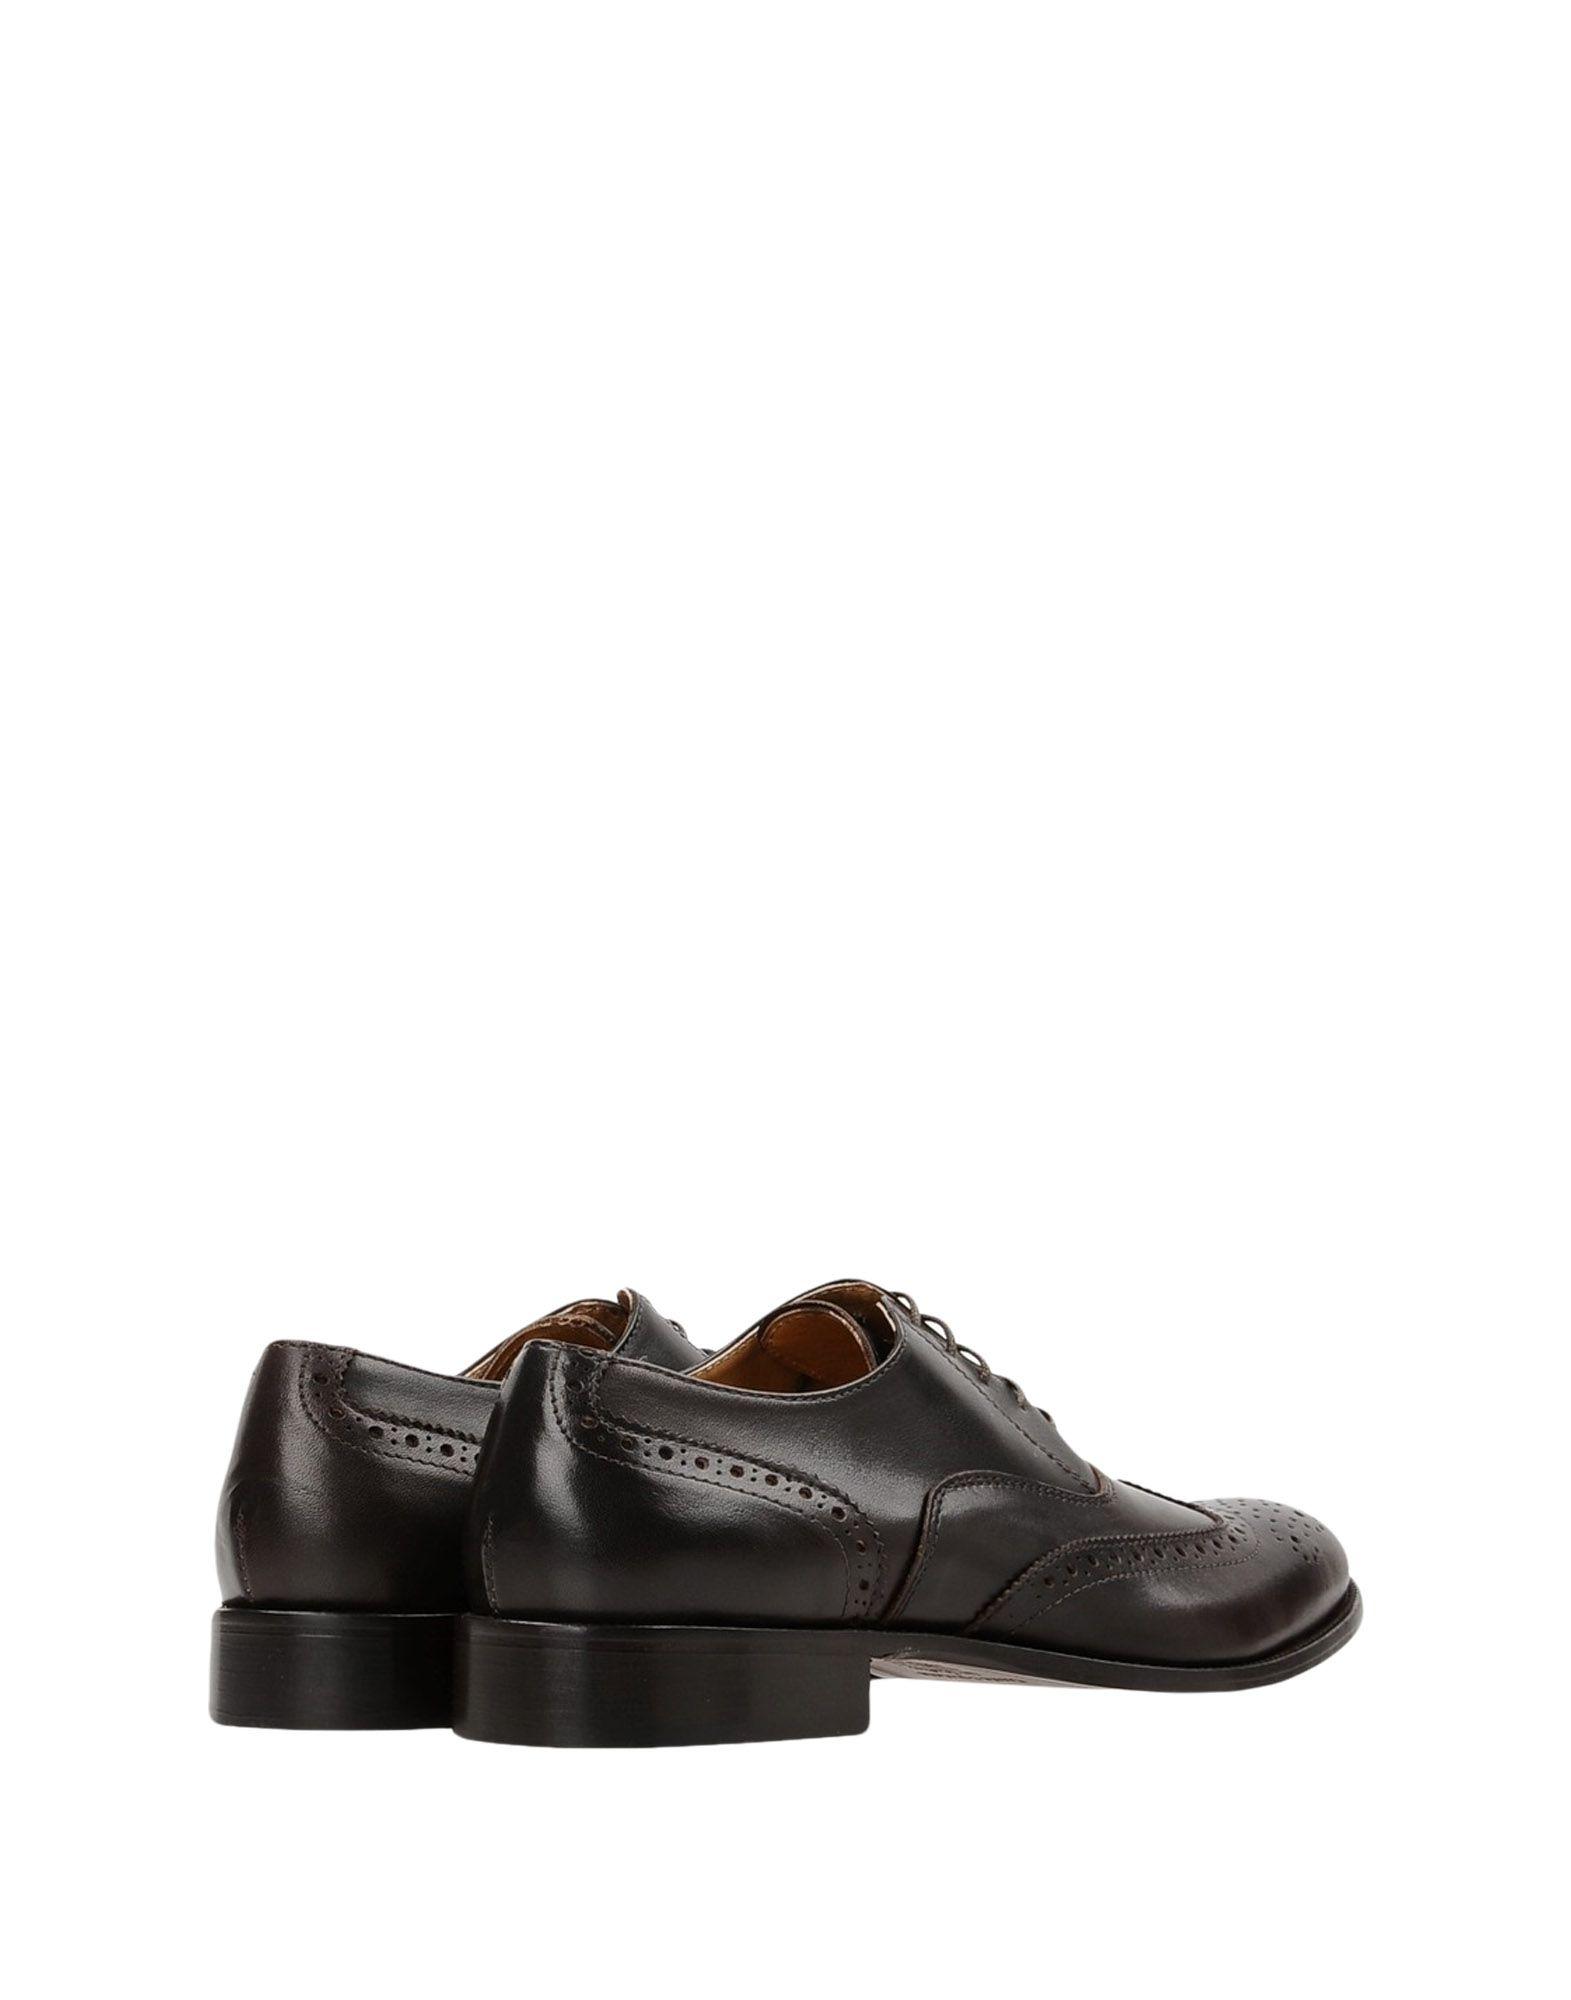 Rabatt Schnürschuhe echte Schuhe John Murphy Schnürschuhe Rabatt Herren  11416110HN 39668c